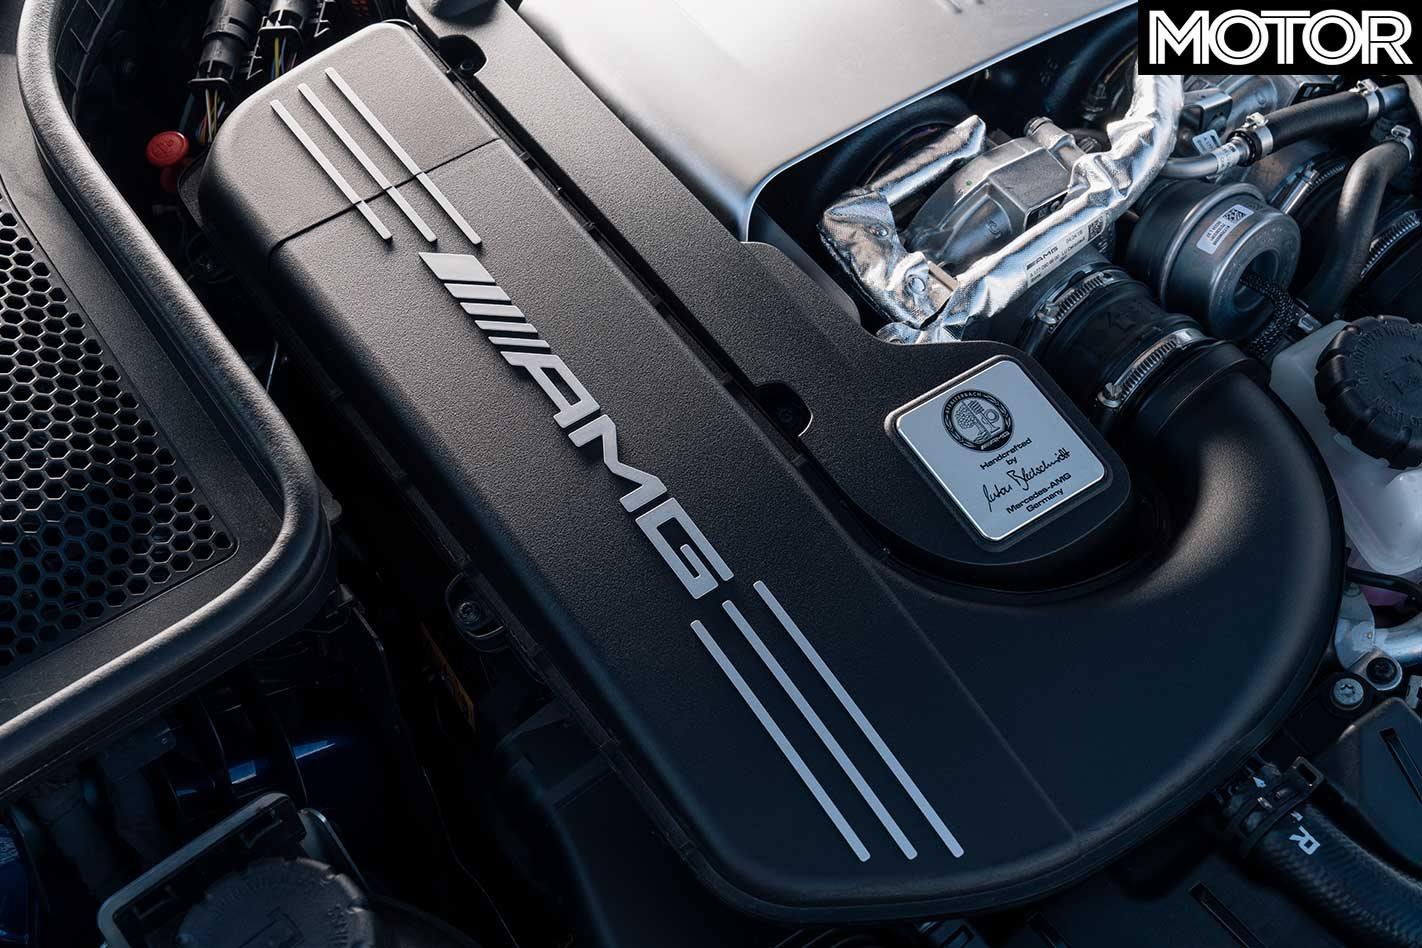 2019 Mercedes-AMG C63 S sedan performance review